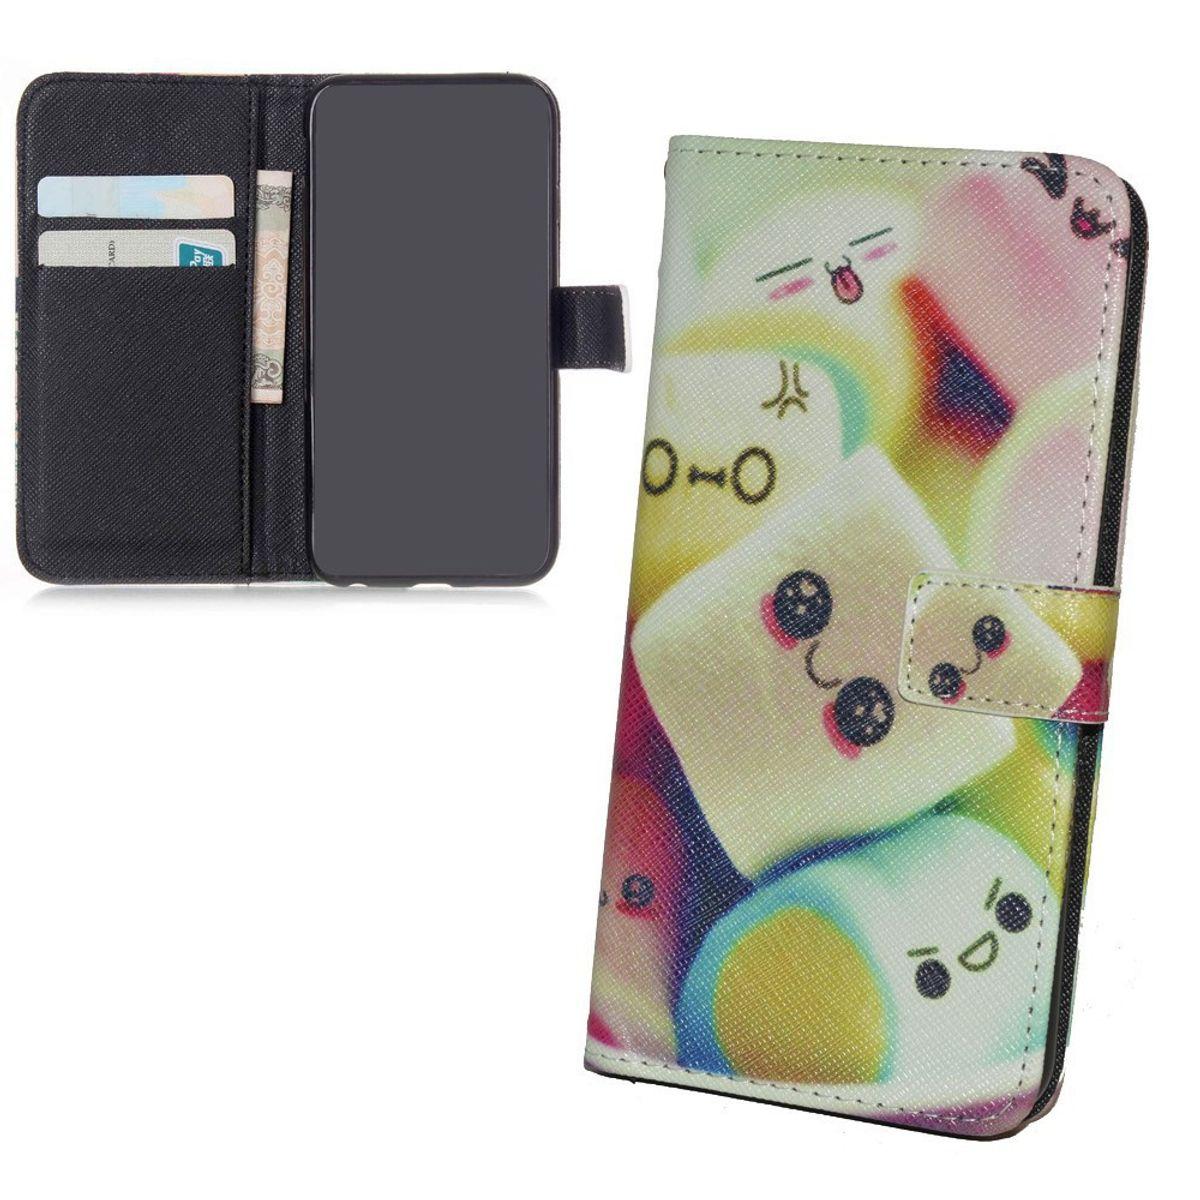 Handyhülle Tasche für Handy Sony Xperia E4G  Marshmallows